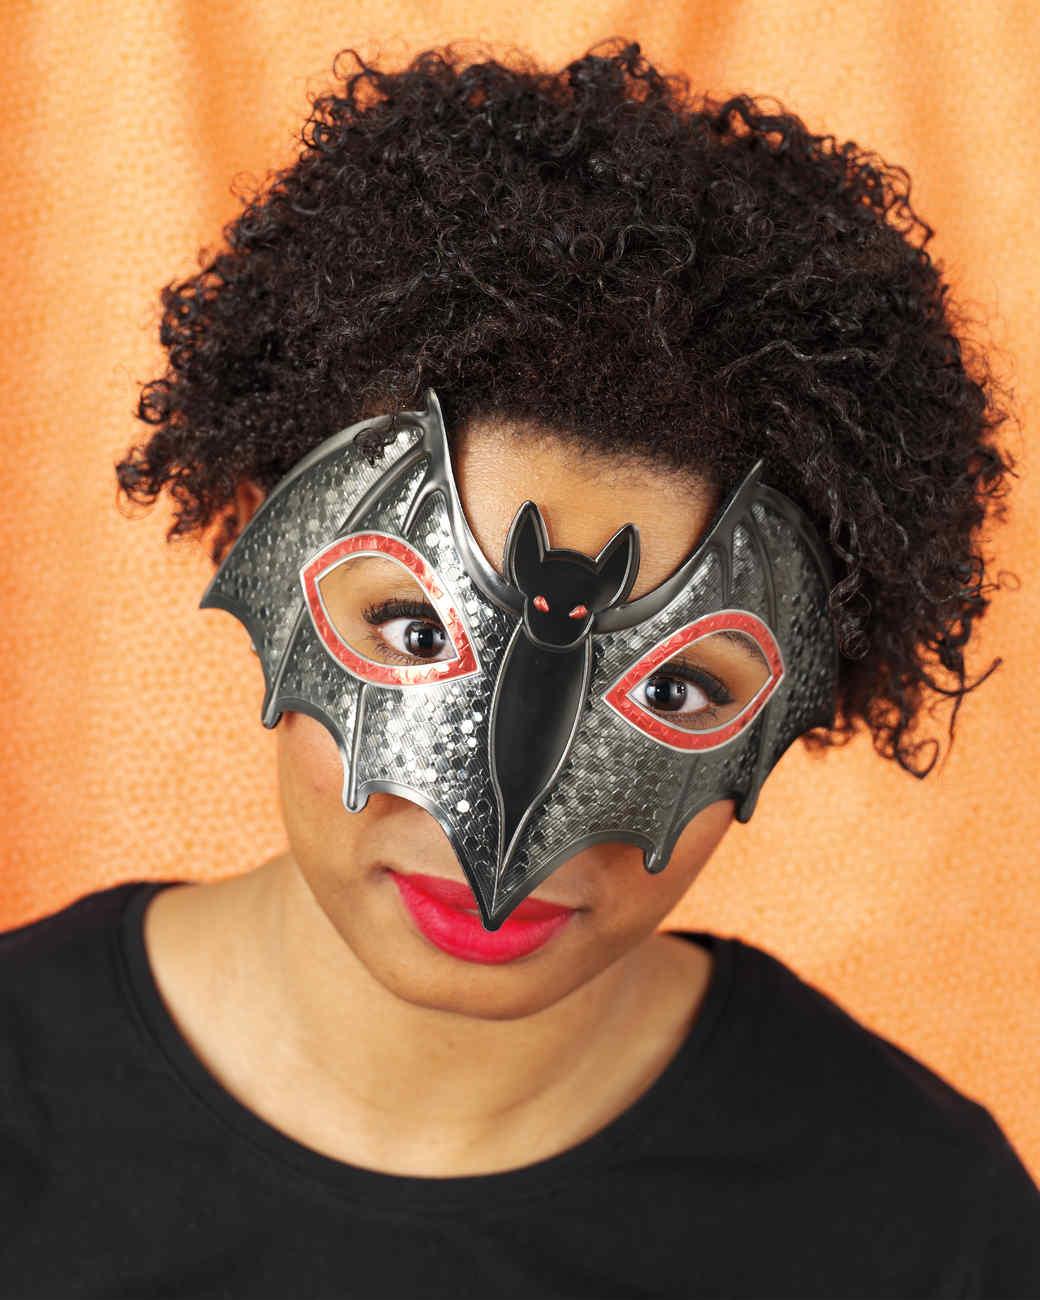 mscrafts-hlwn-mask1.jpg